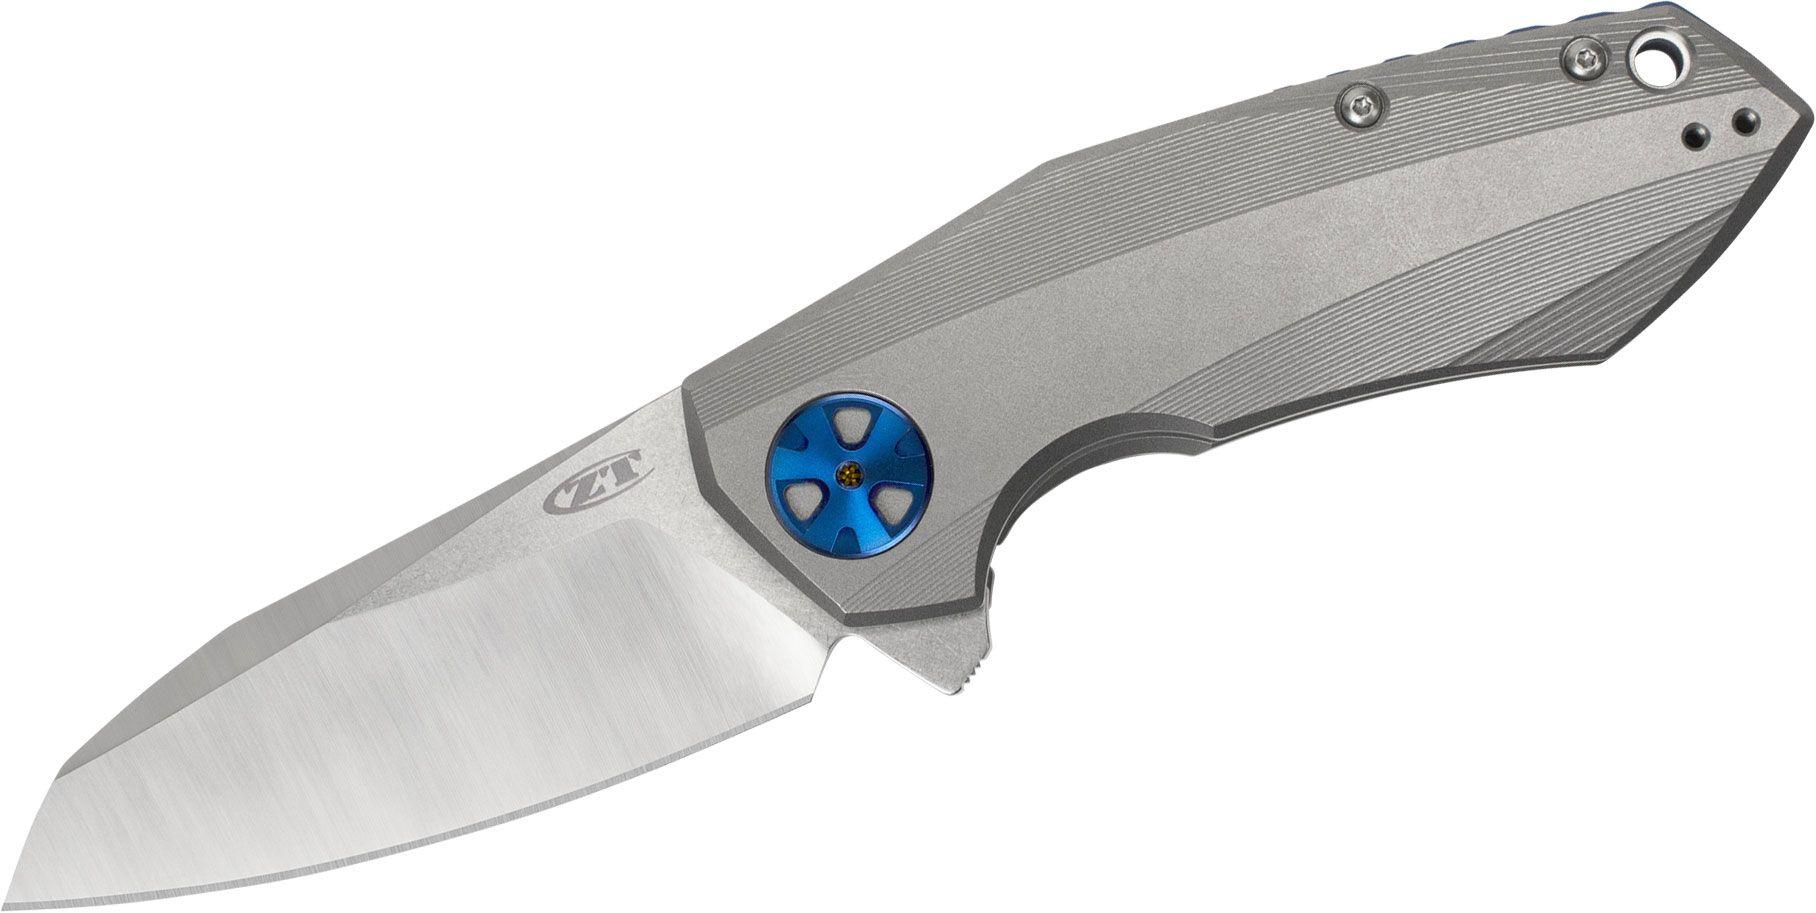 Zero Tolerance 0456 Dmitry Sinkevich Flipper 3.25 inch CPM-20CV Two-Tone Blade, Titanium Handles